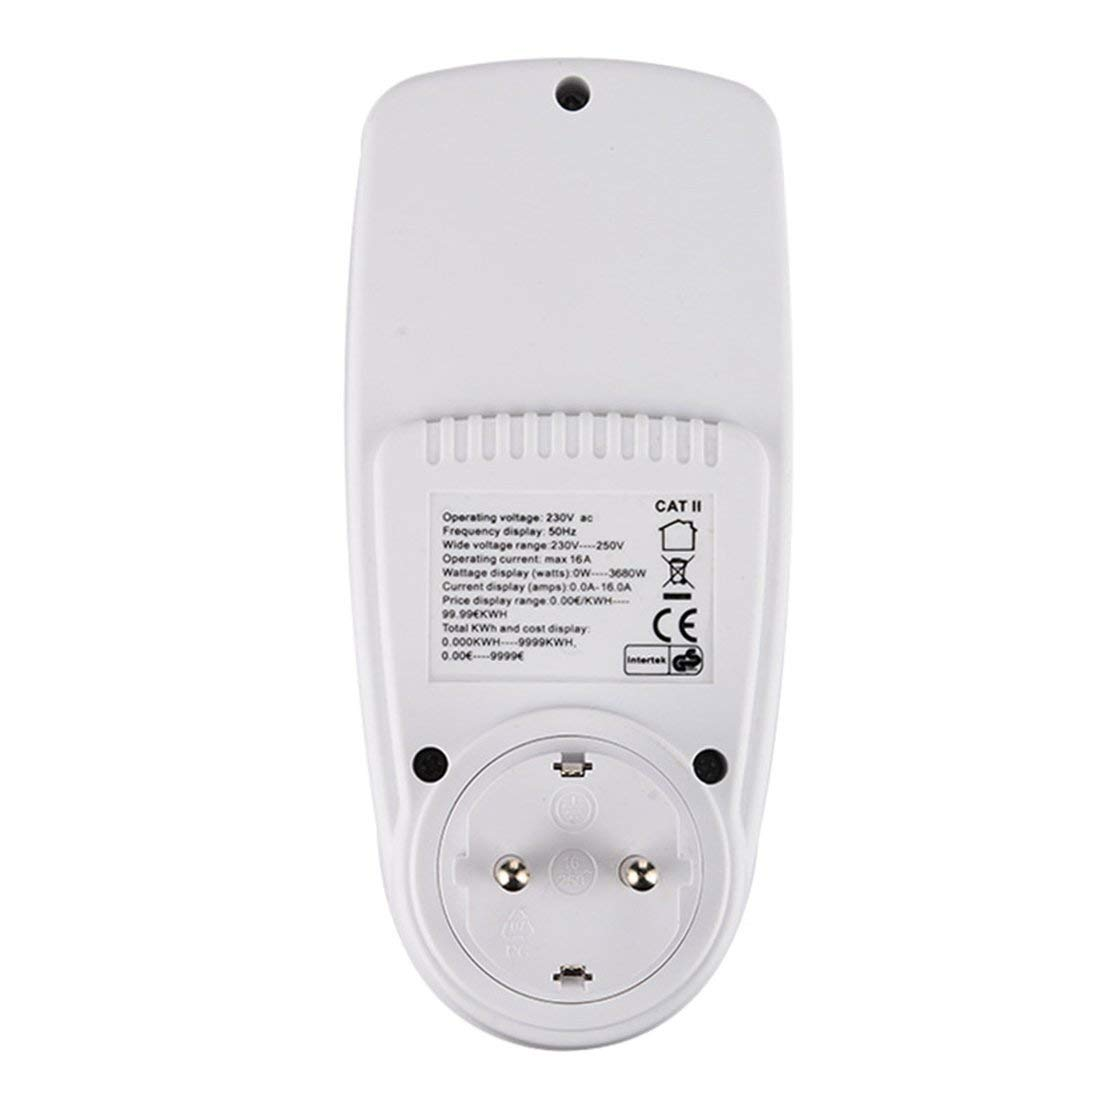 Erneuerbare Energie Smart Kwe-pmb01 Plug Socket Digital Voltage Wattmeter Electricity Analyzer Monitor Wt